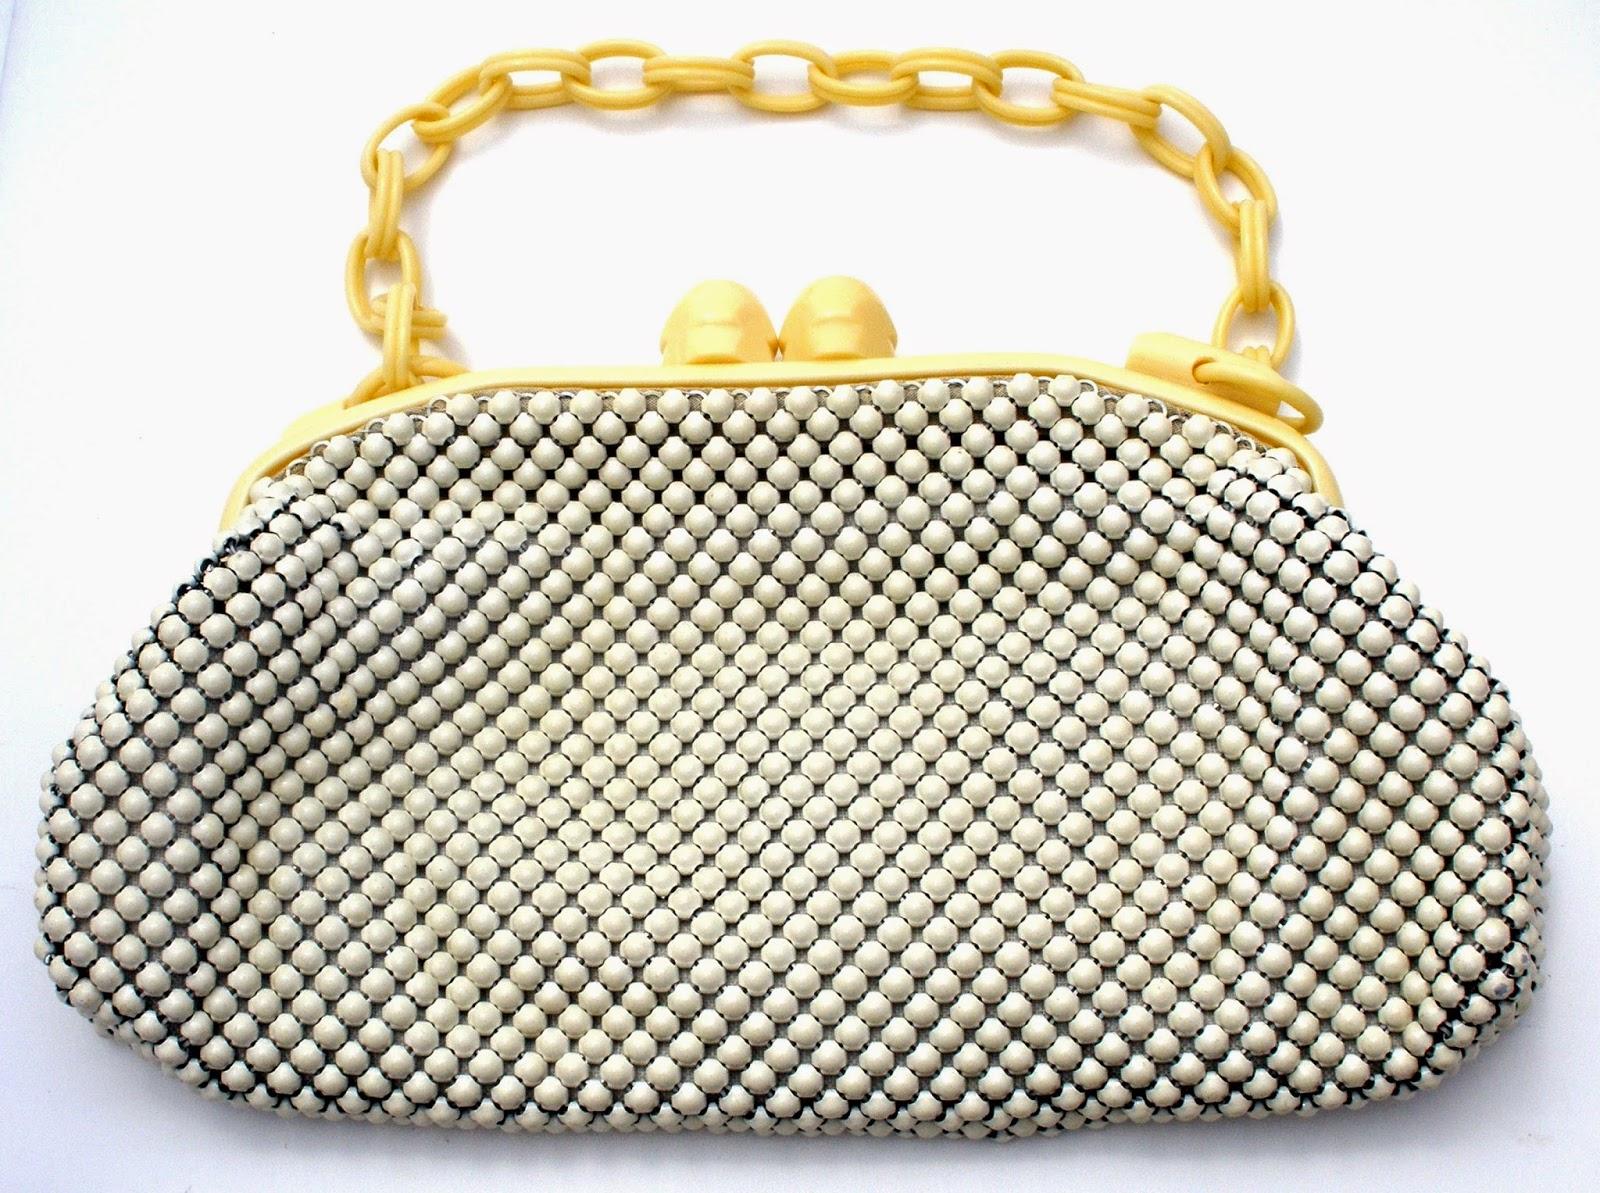 498cb514bb The Jewelry Lady s Store  Whiting   Davis White Enamel Mesh Purse